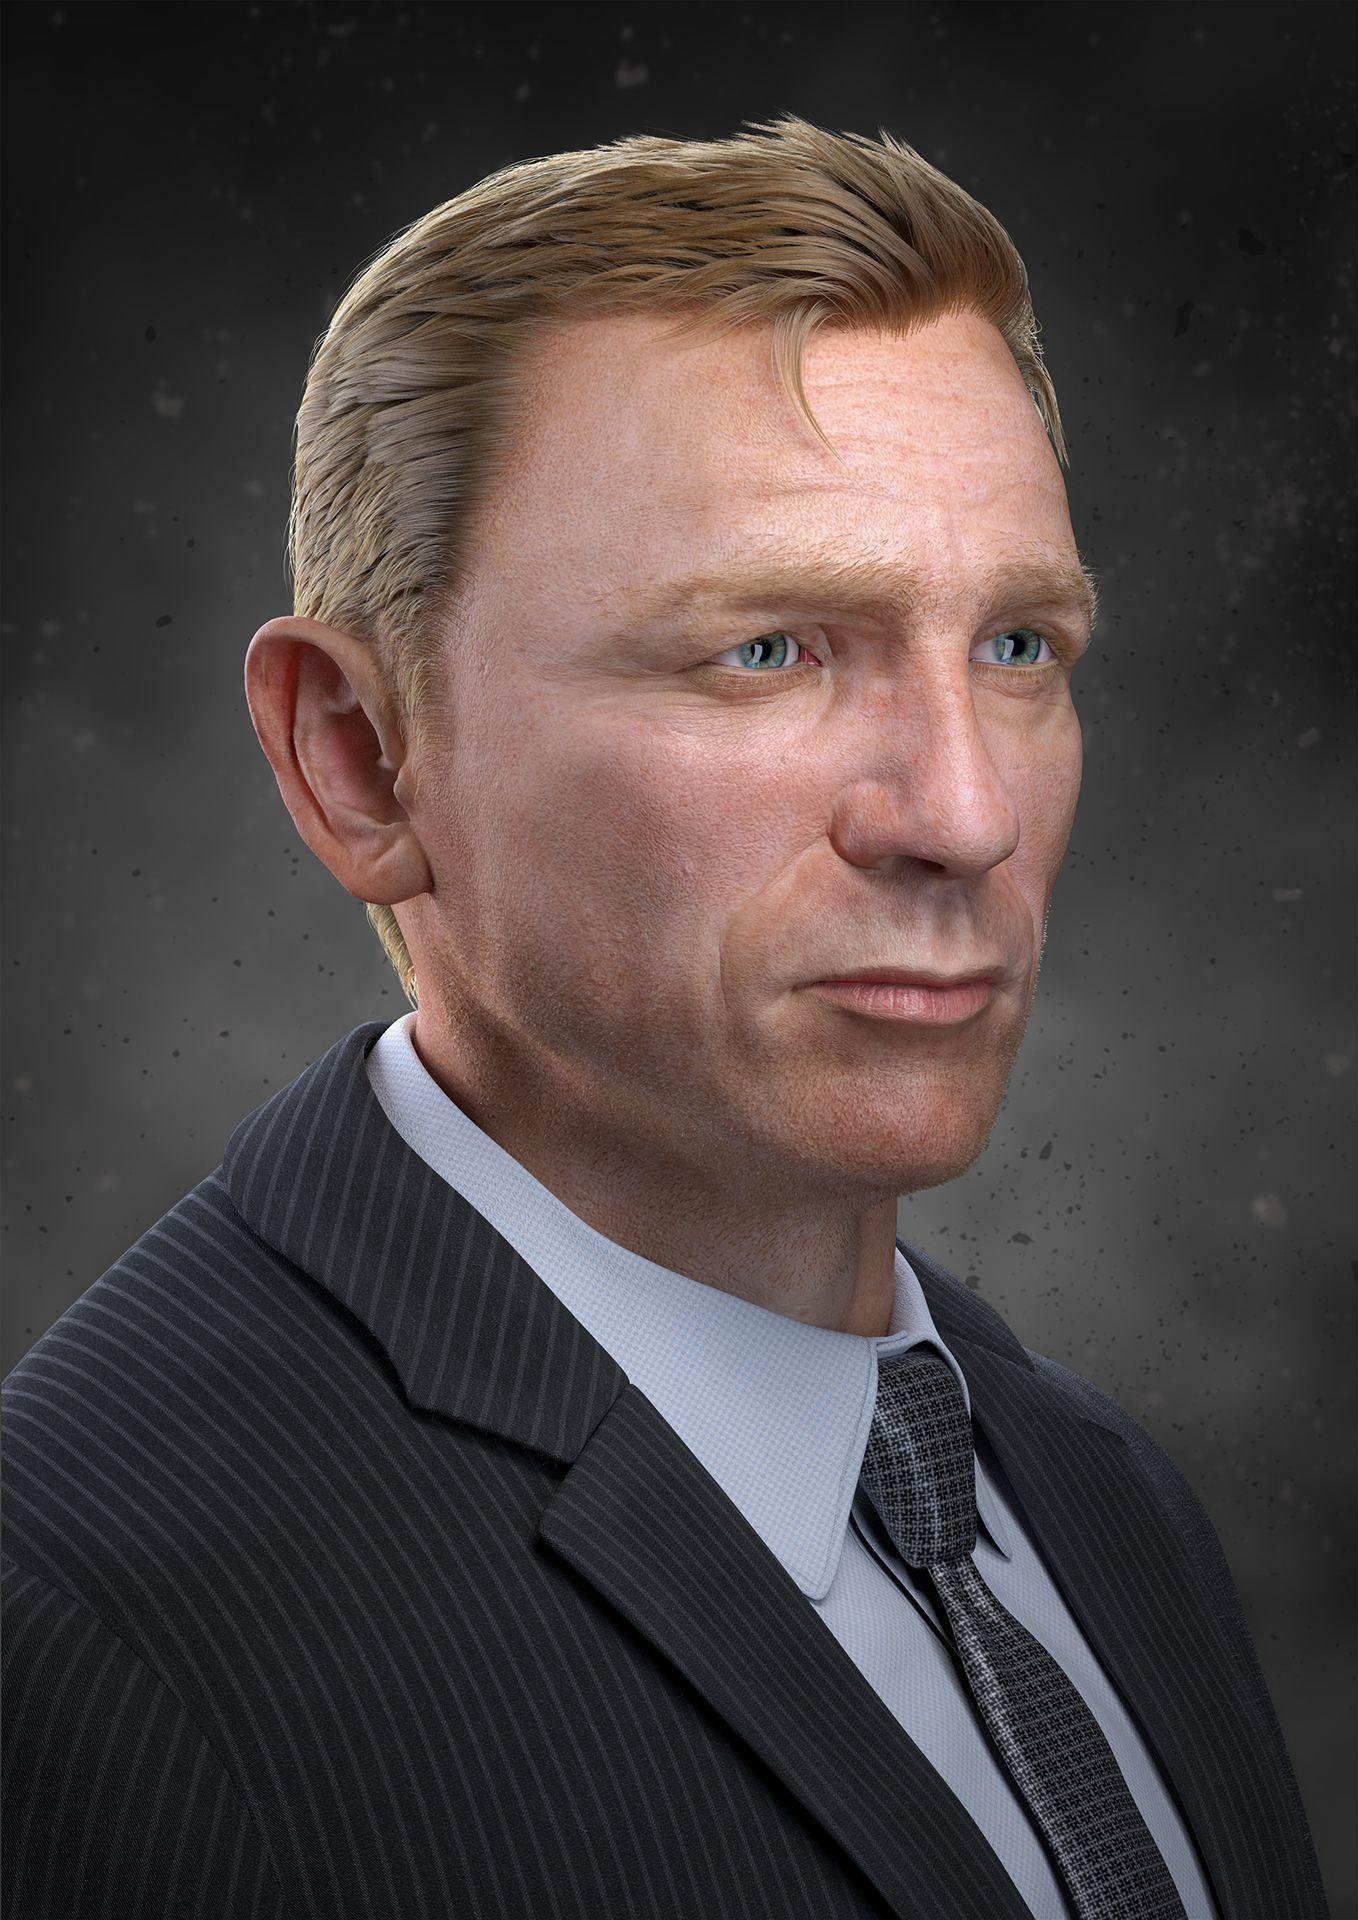 Daniel%20 Craig%20 Portrait%203 Thomasongo